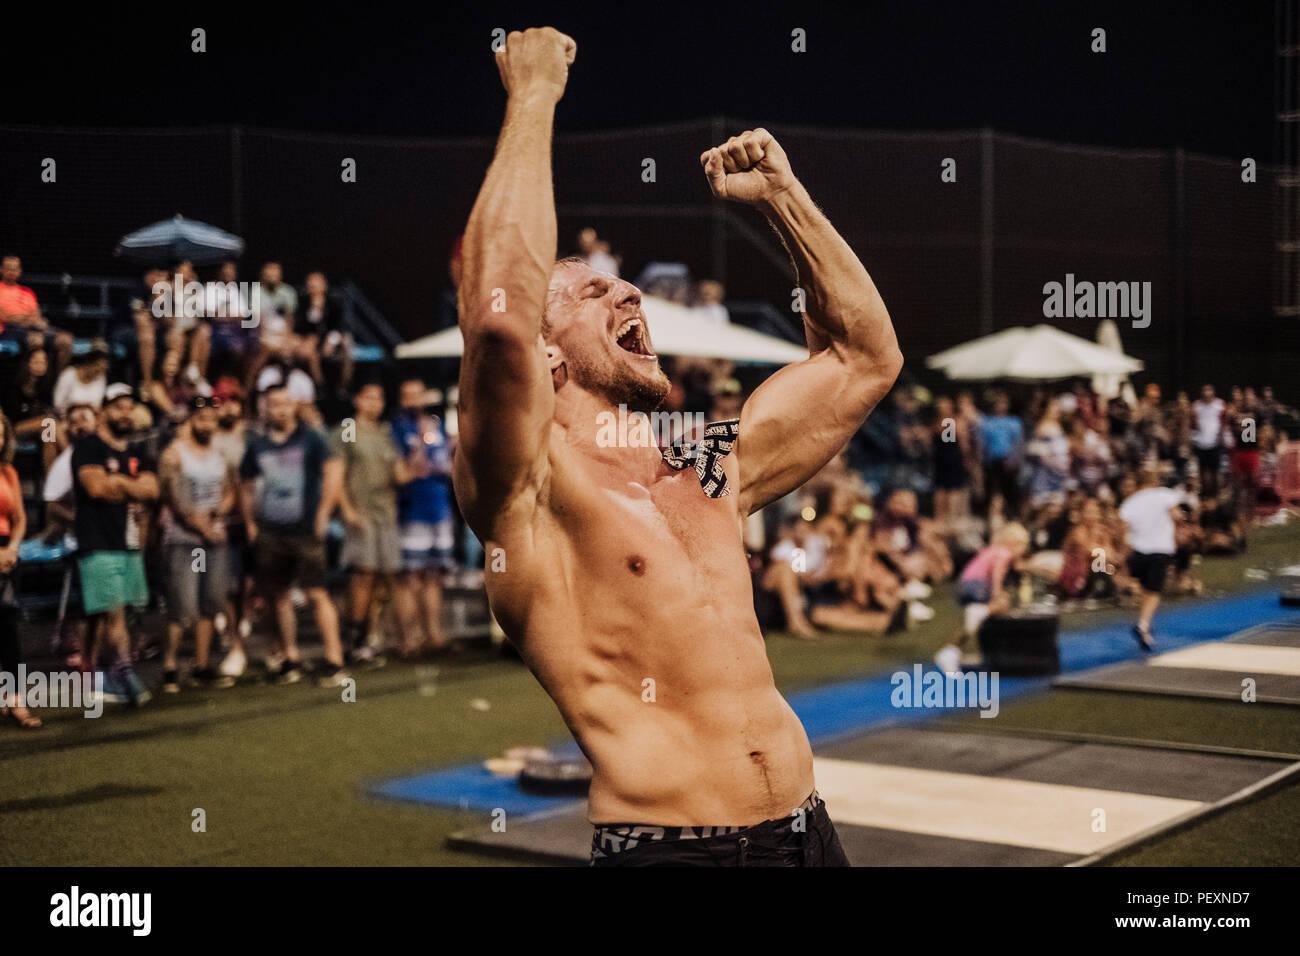 Crossfit athlete celebrating victory - Stock Image